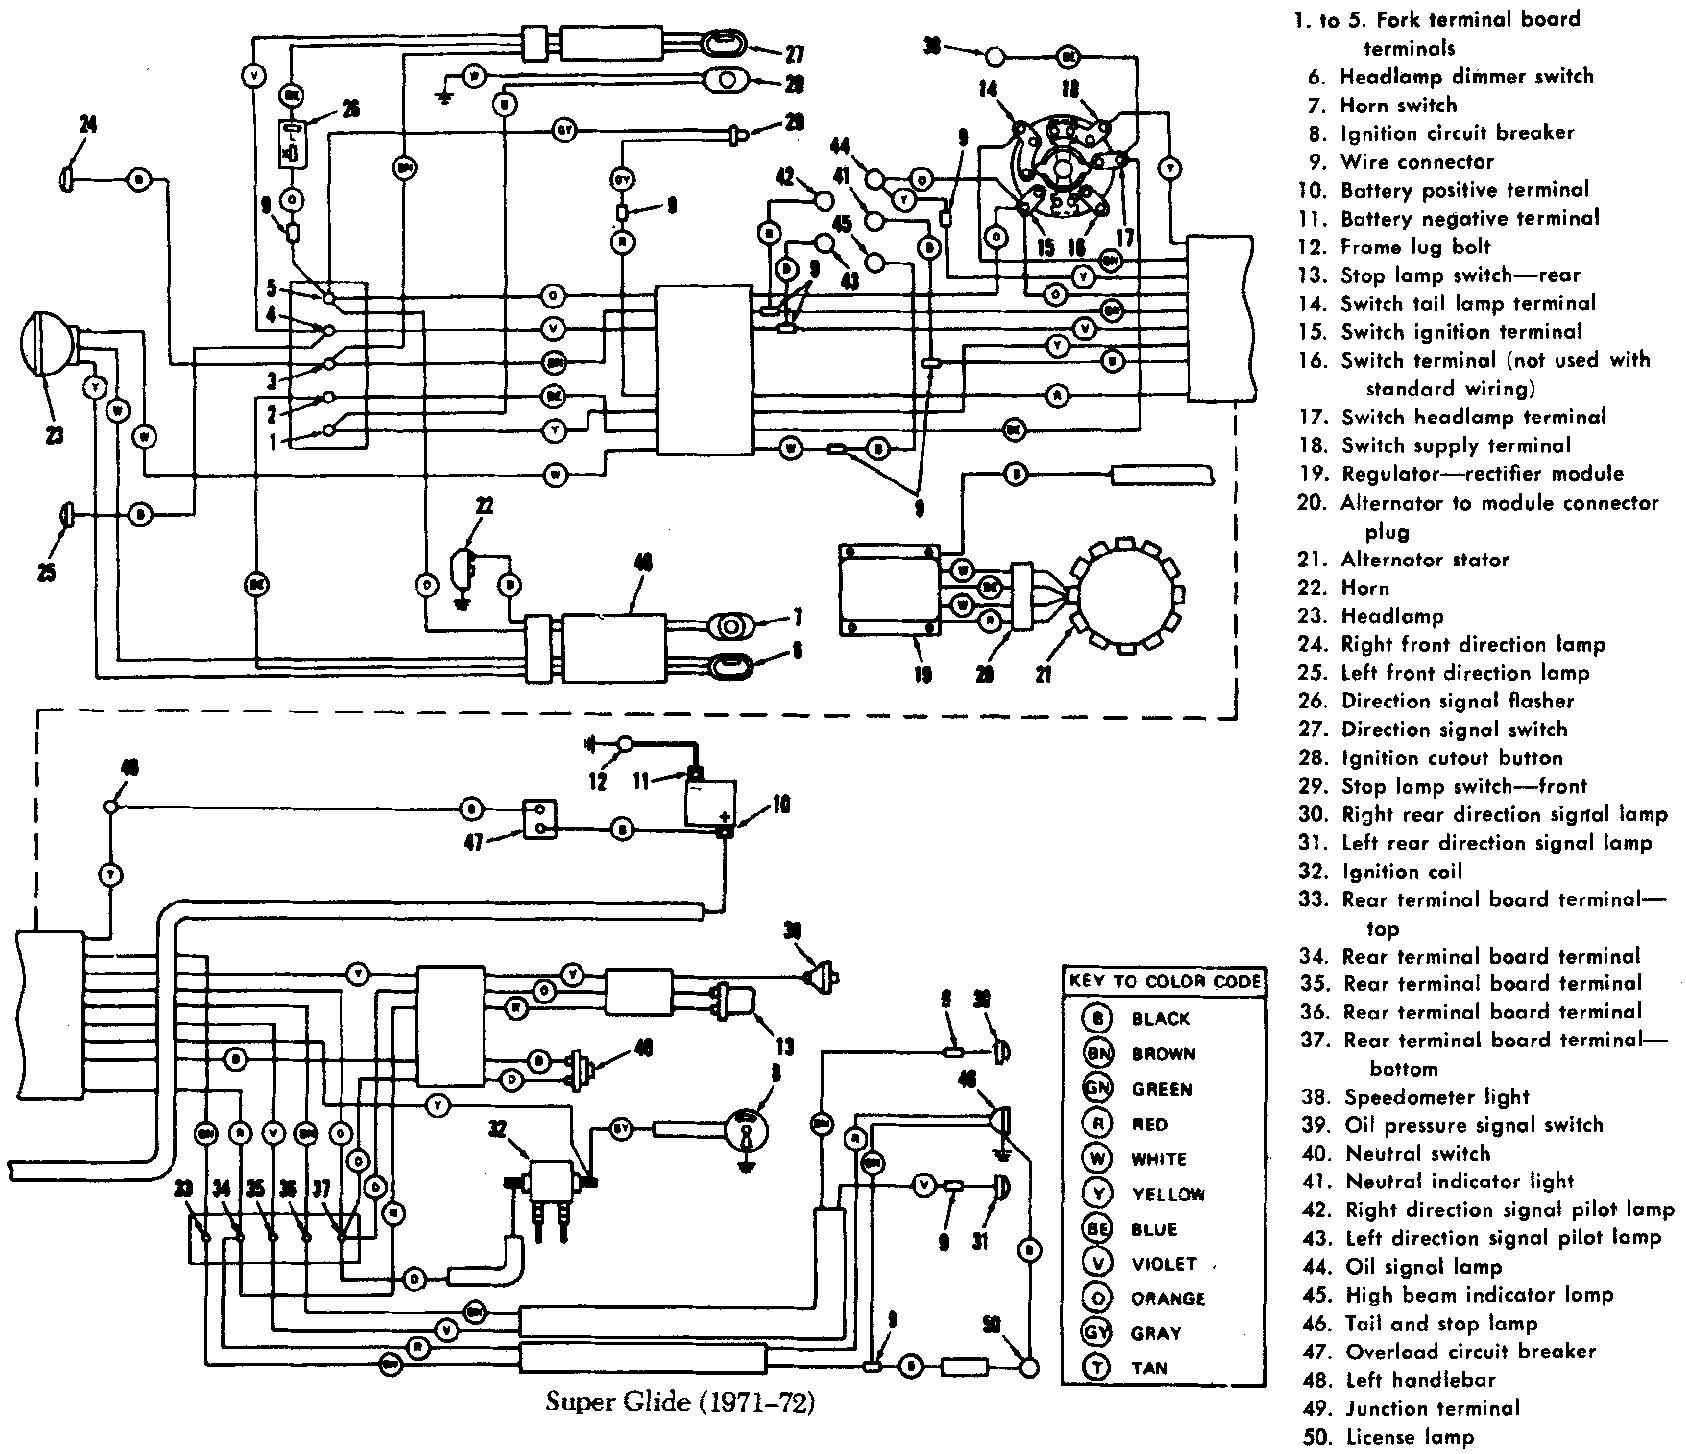 harley accessory plug wiring diagram inspirational wiring diagram harley  davidson engine problems gallery of fresh harley